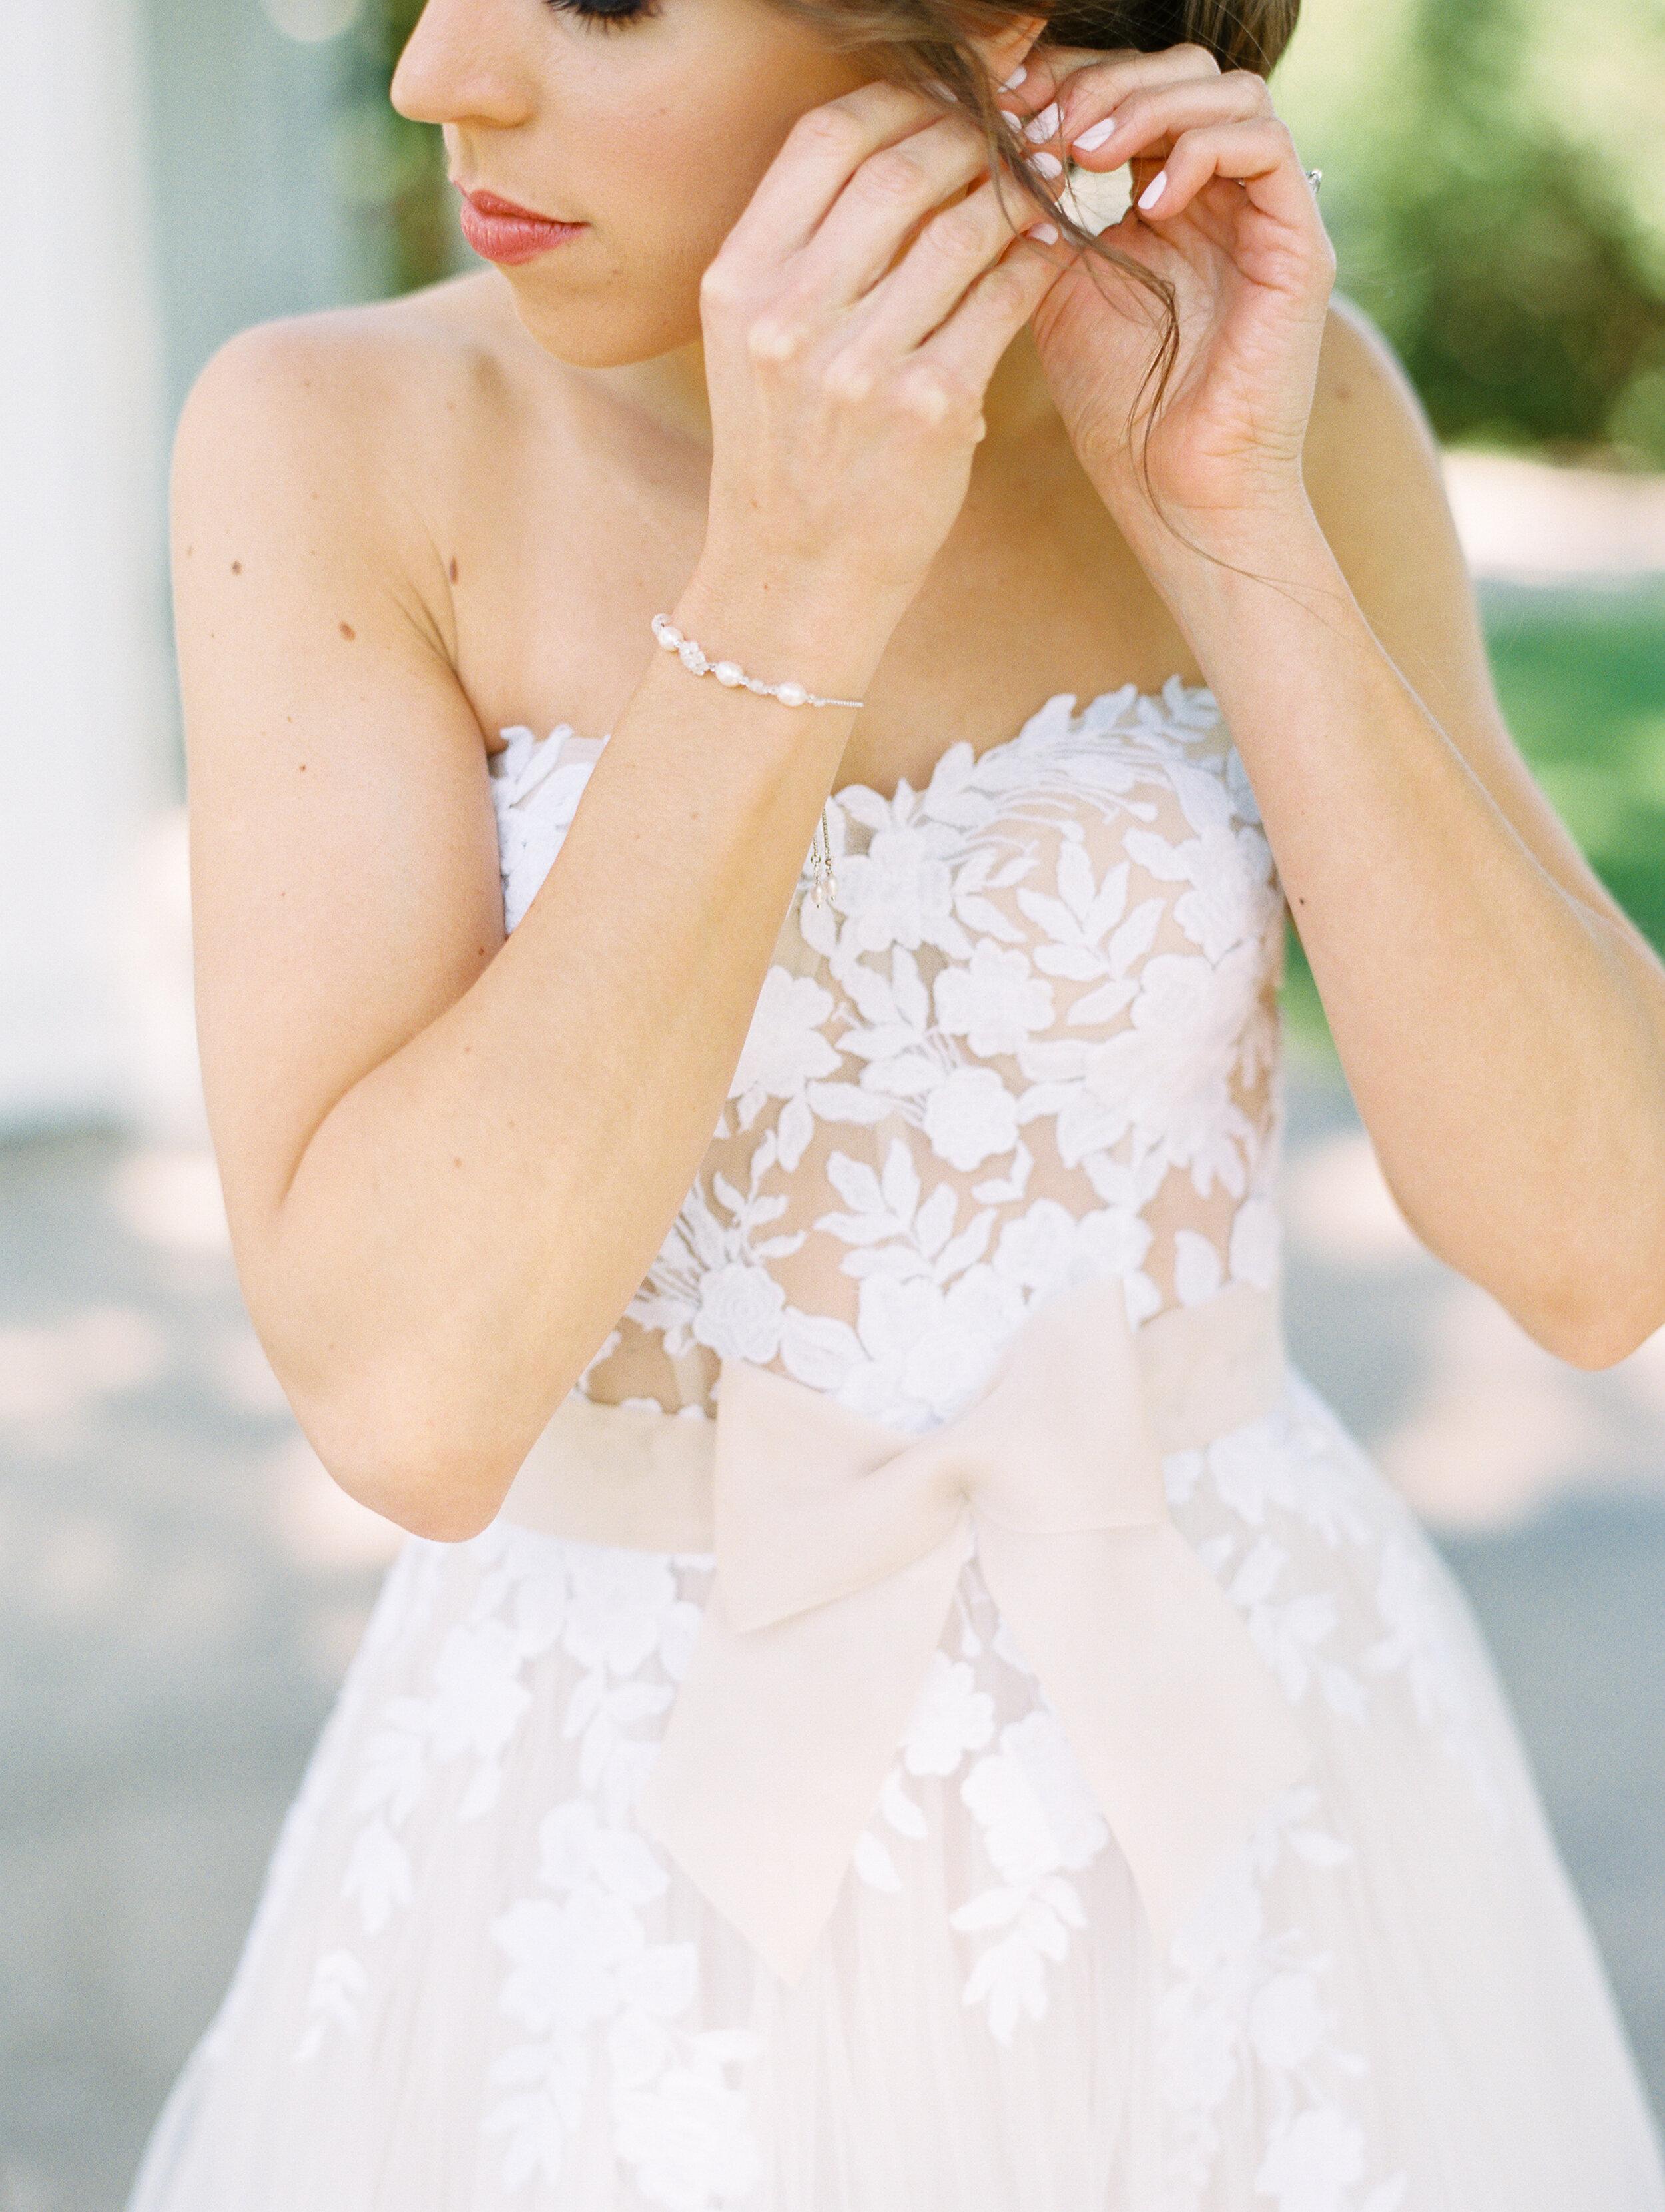 Steinlage+Wedding+Getting+Ready-105.jpg